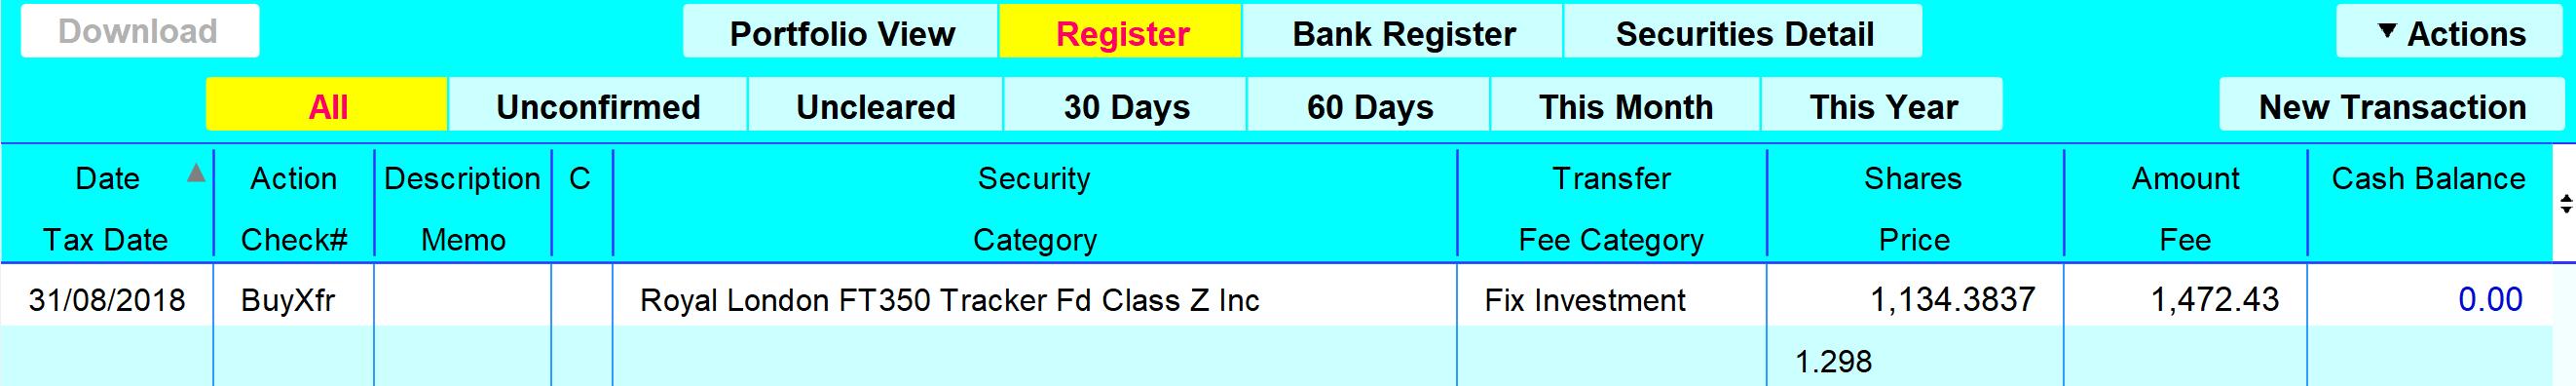 Investment_account_register